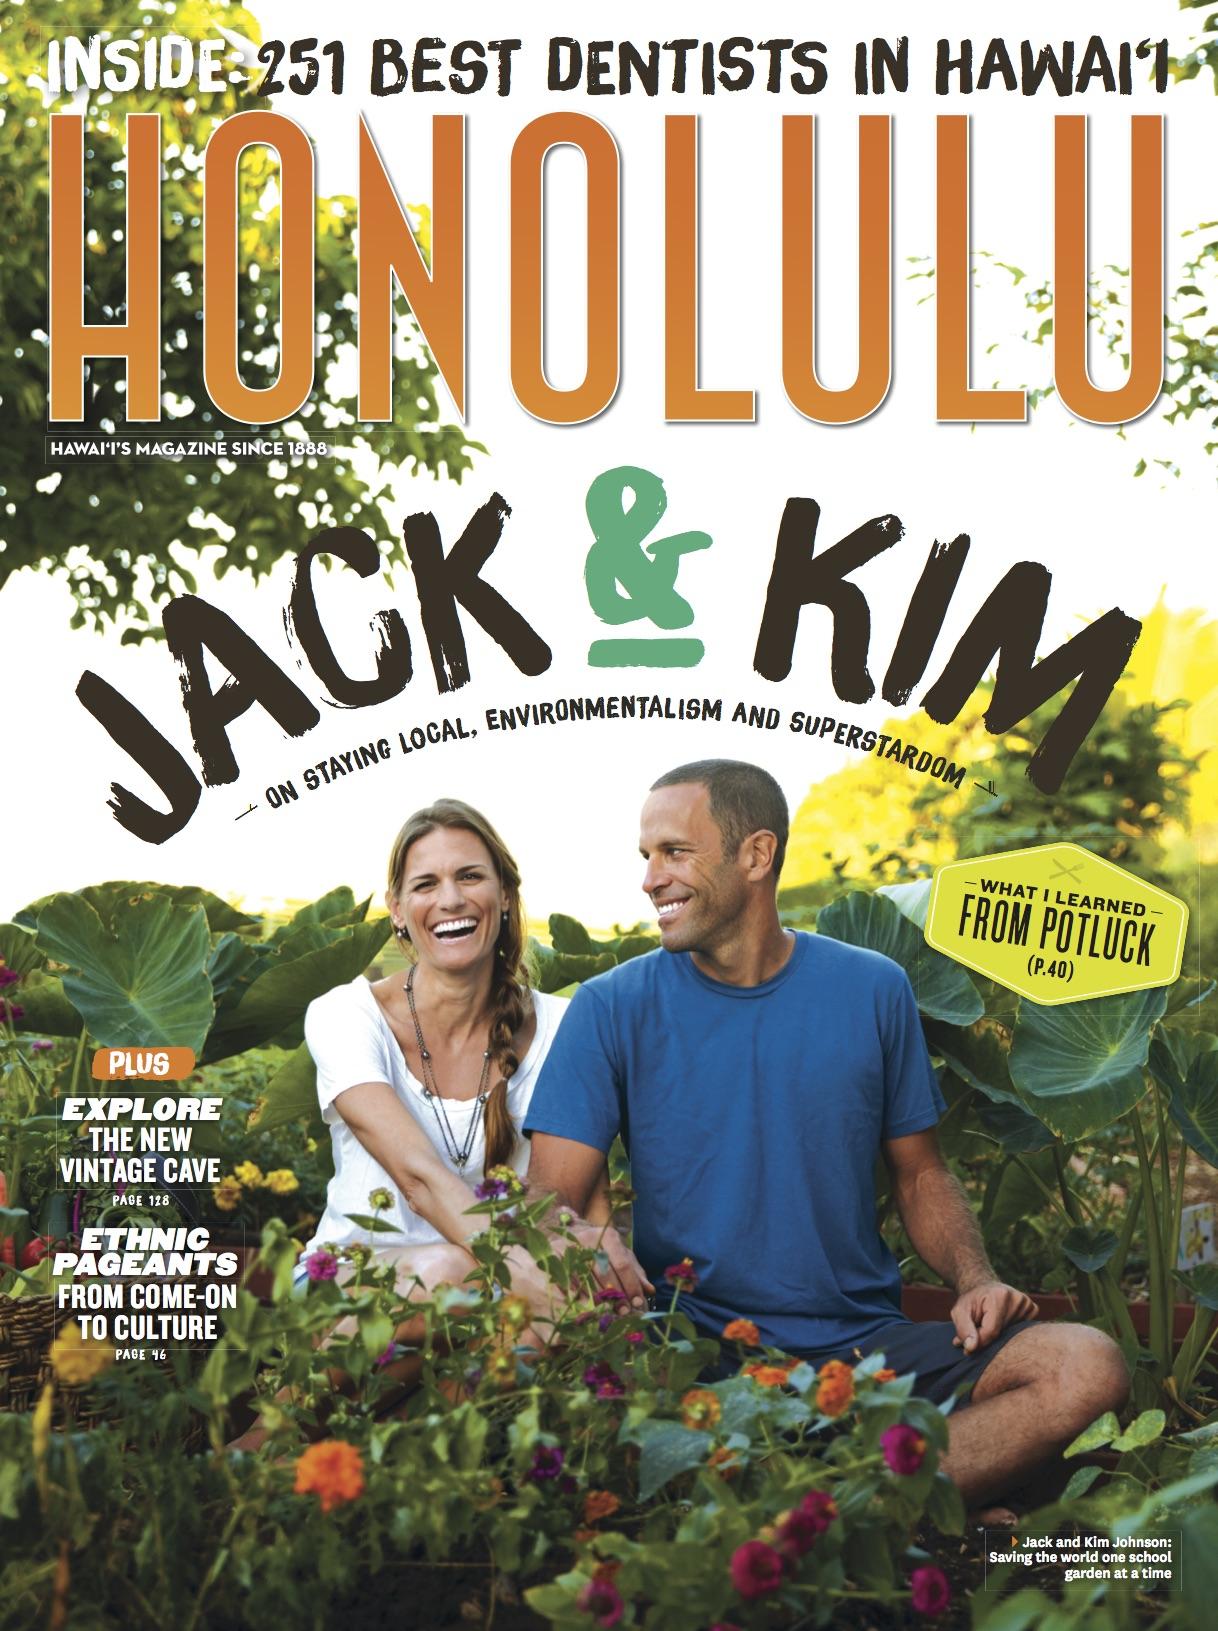 Honolulu Magazine Jack Johnson On Staying Local Environmentalism And Superstardom Kokua News